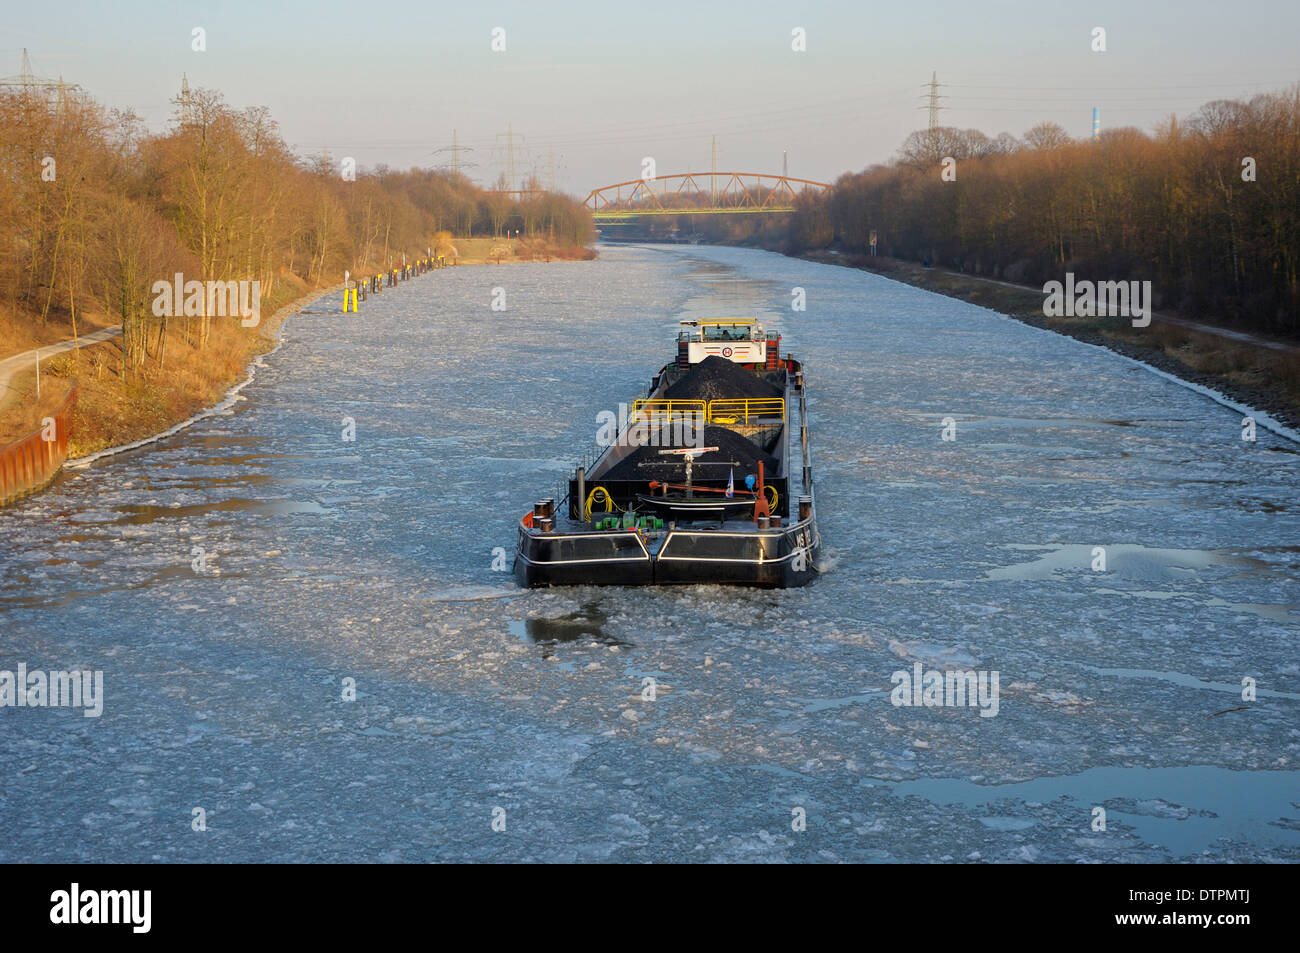 Rhine-Herne canal, Rhein-Herne-Kanal, February, Oberhausen, North Rhine-Westphalia, Germany - Stock Image